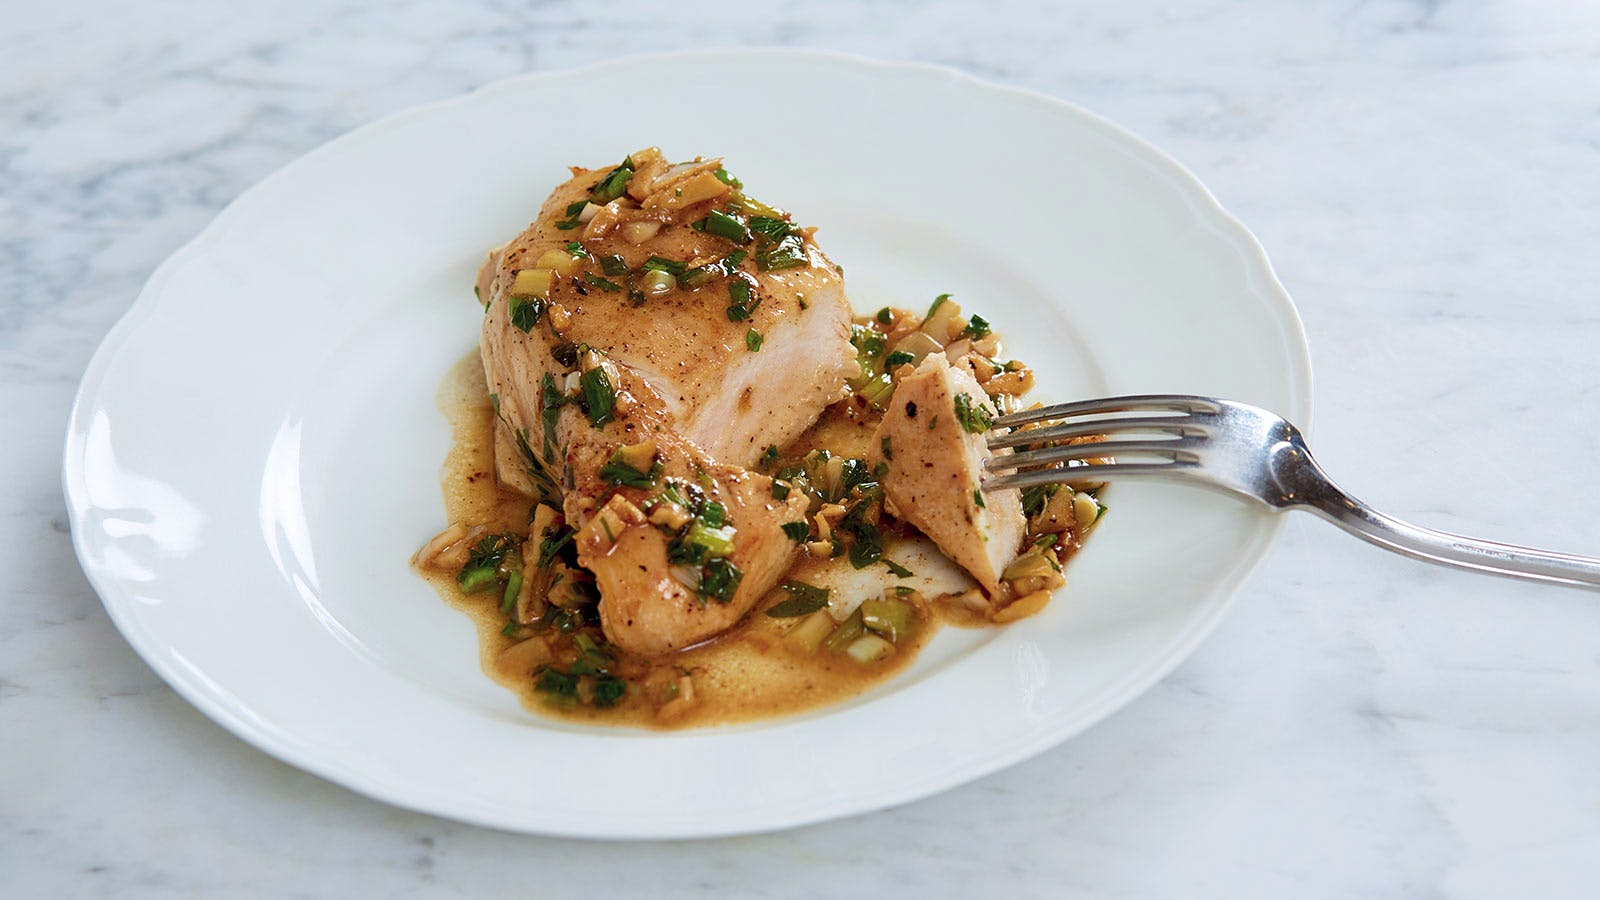 Jacques Pépin's Chicken Suprêmes